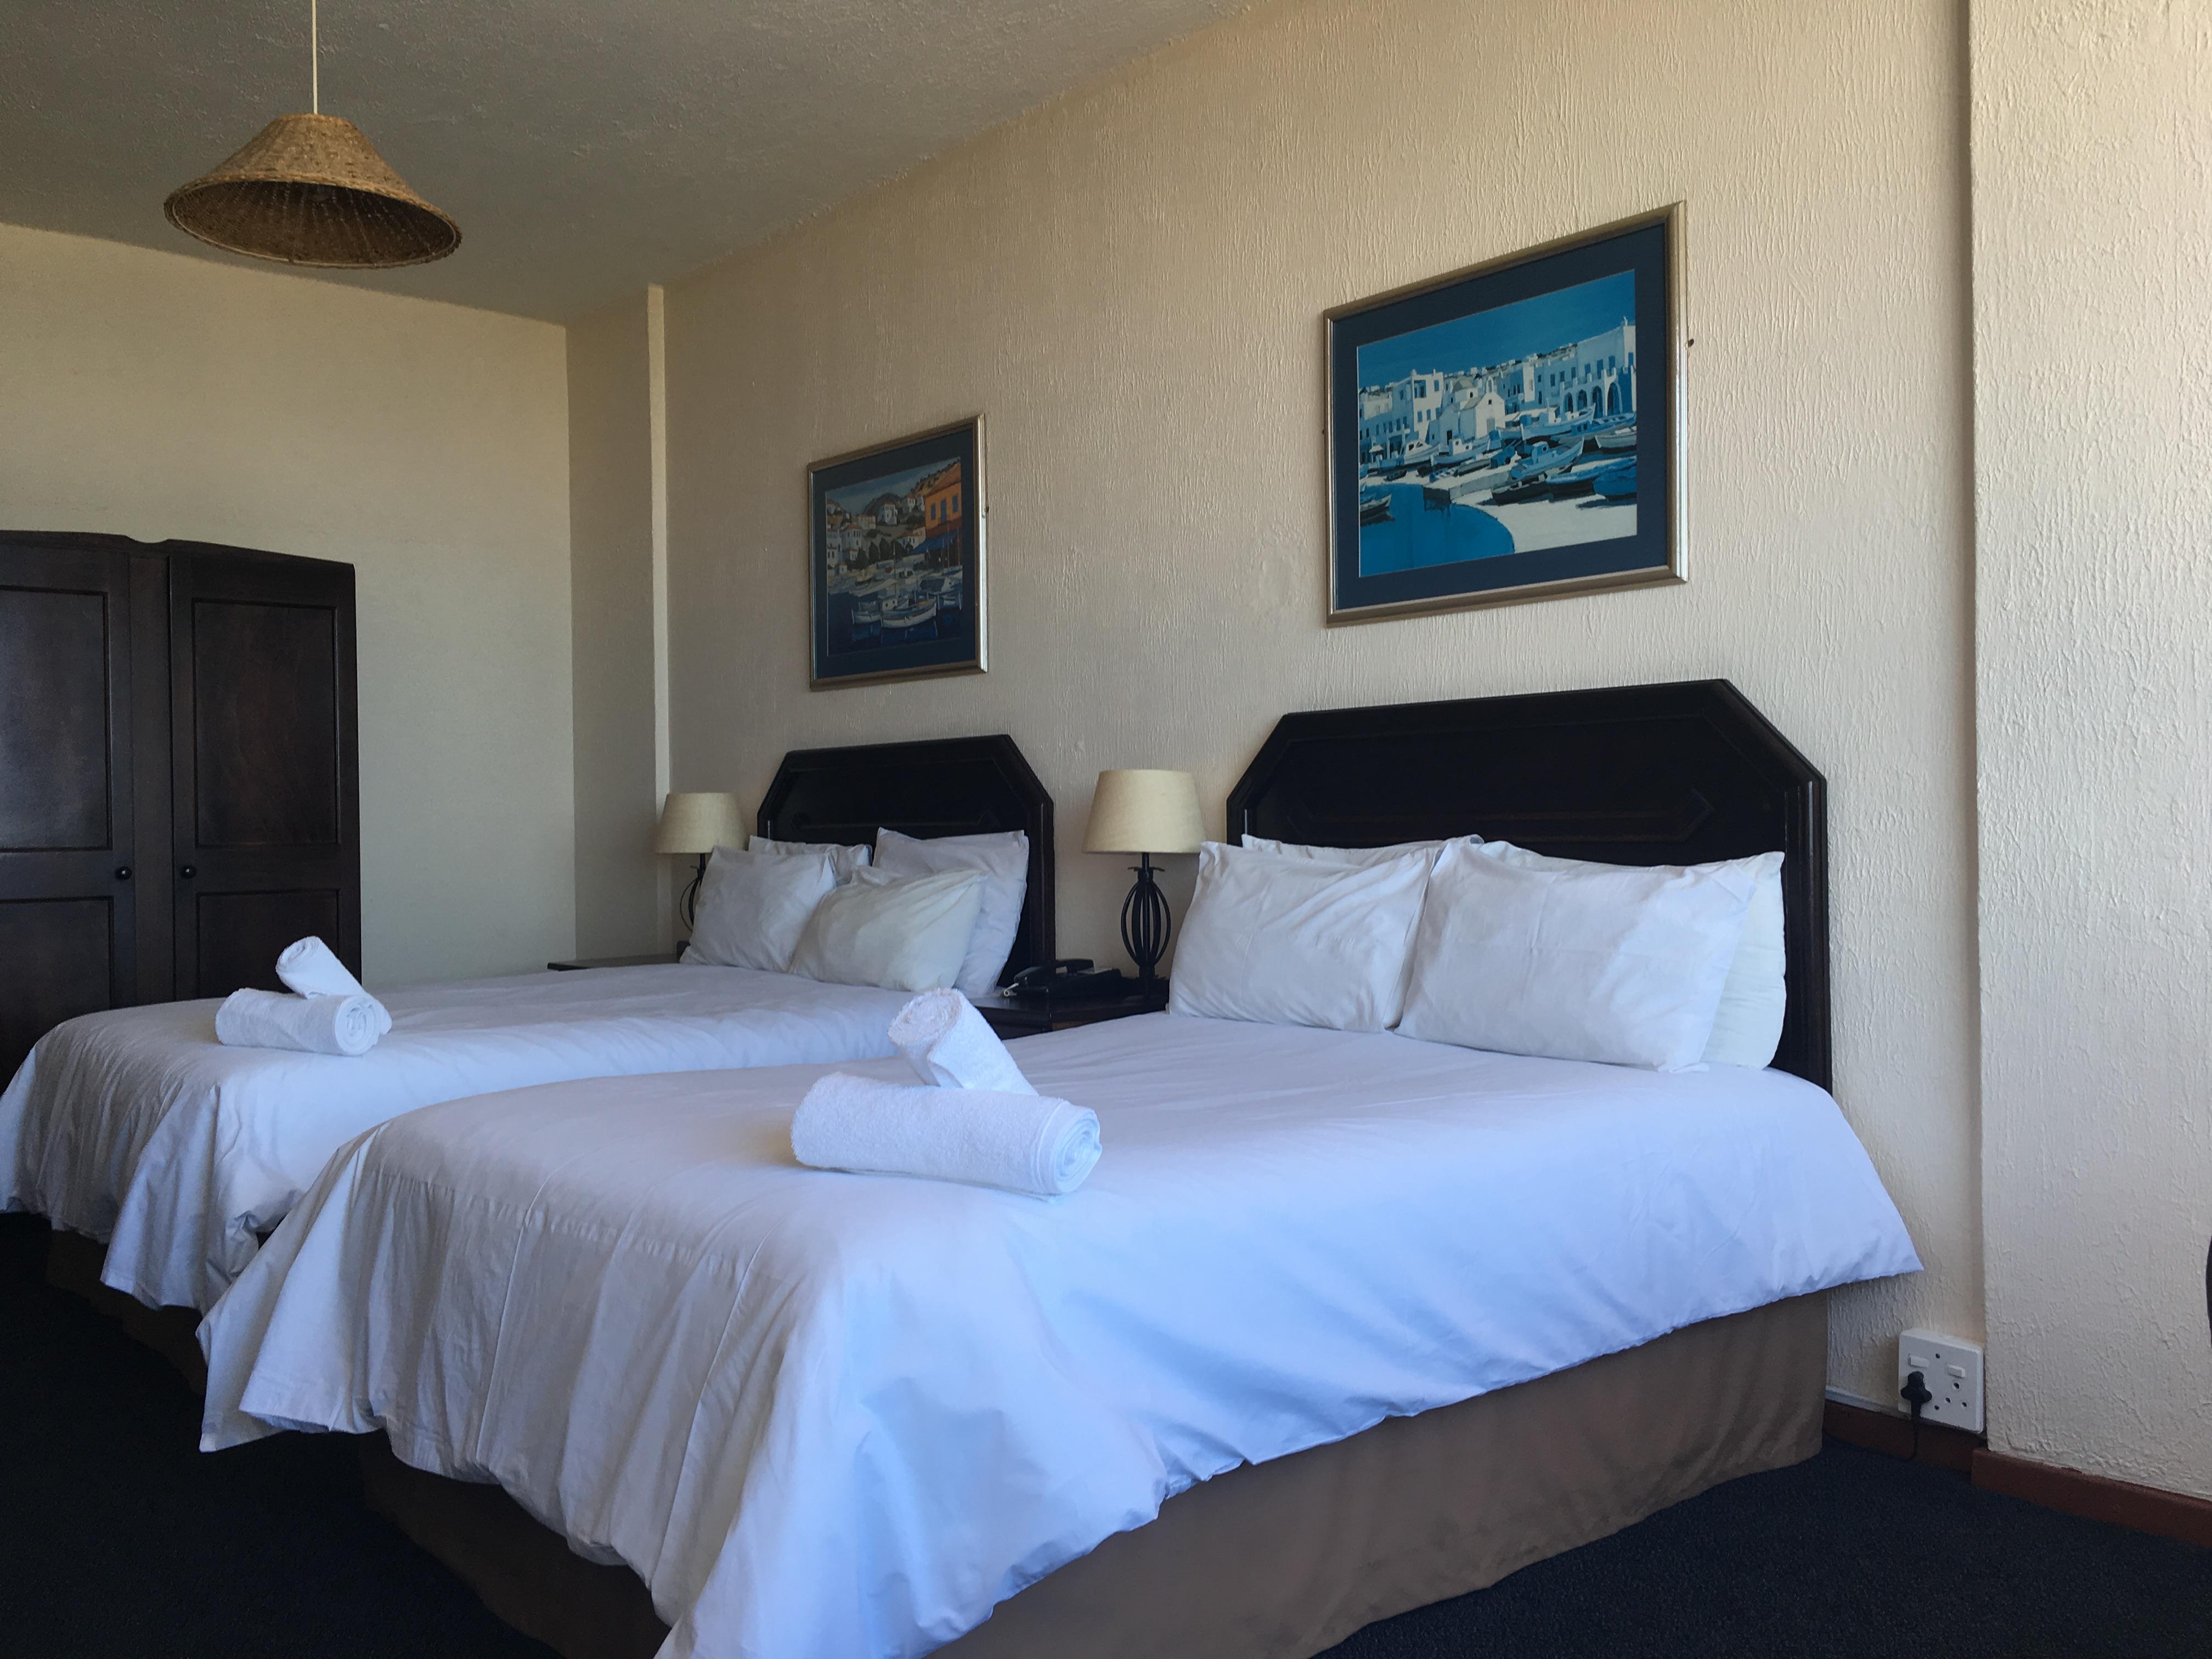 Gooderson Beach Hotel, eThekwini